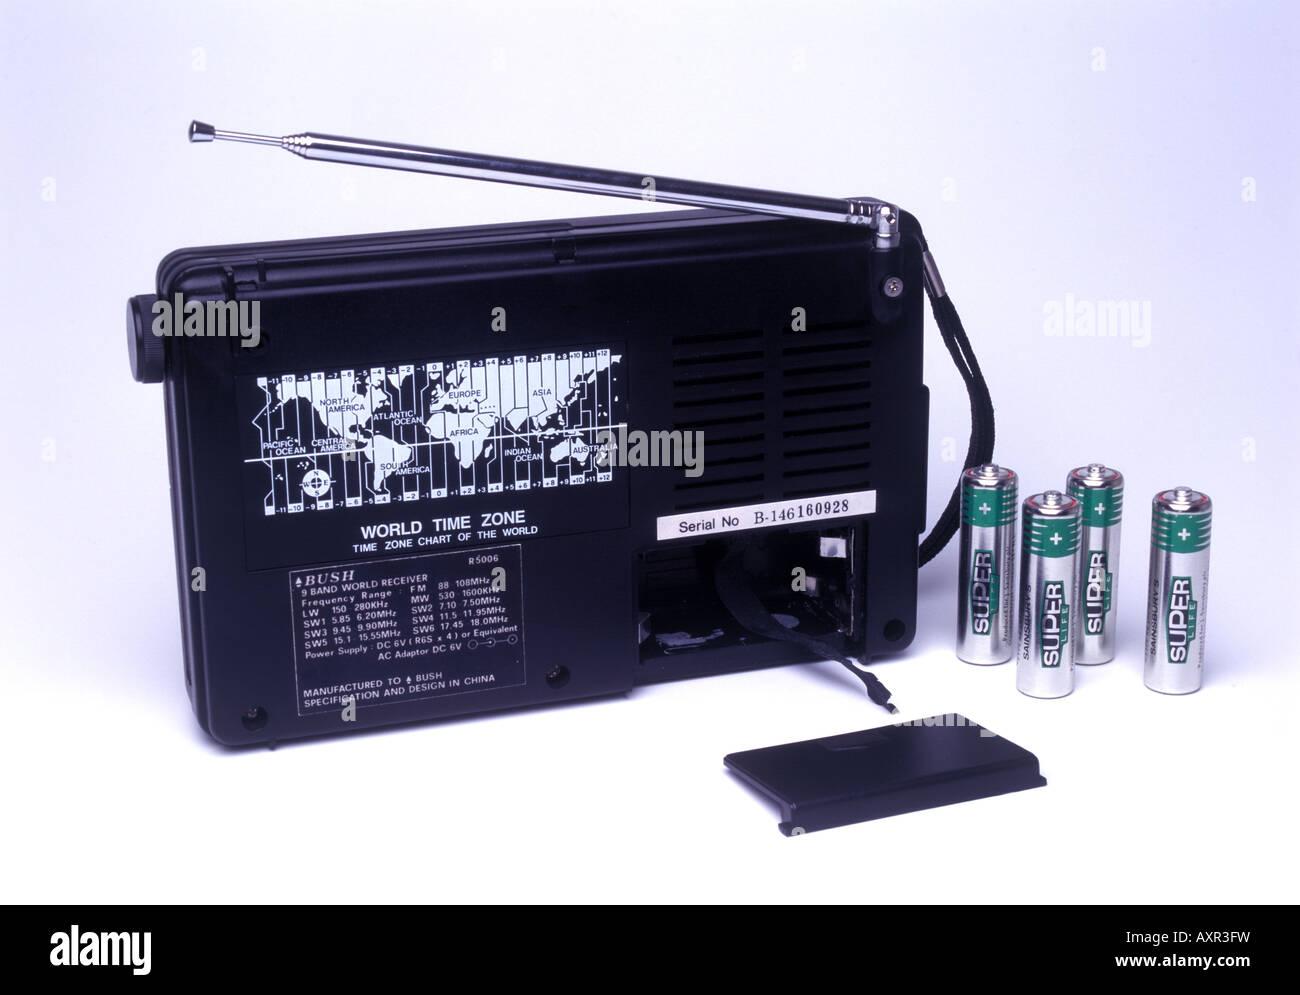 portable radio world time zone - Stock Image